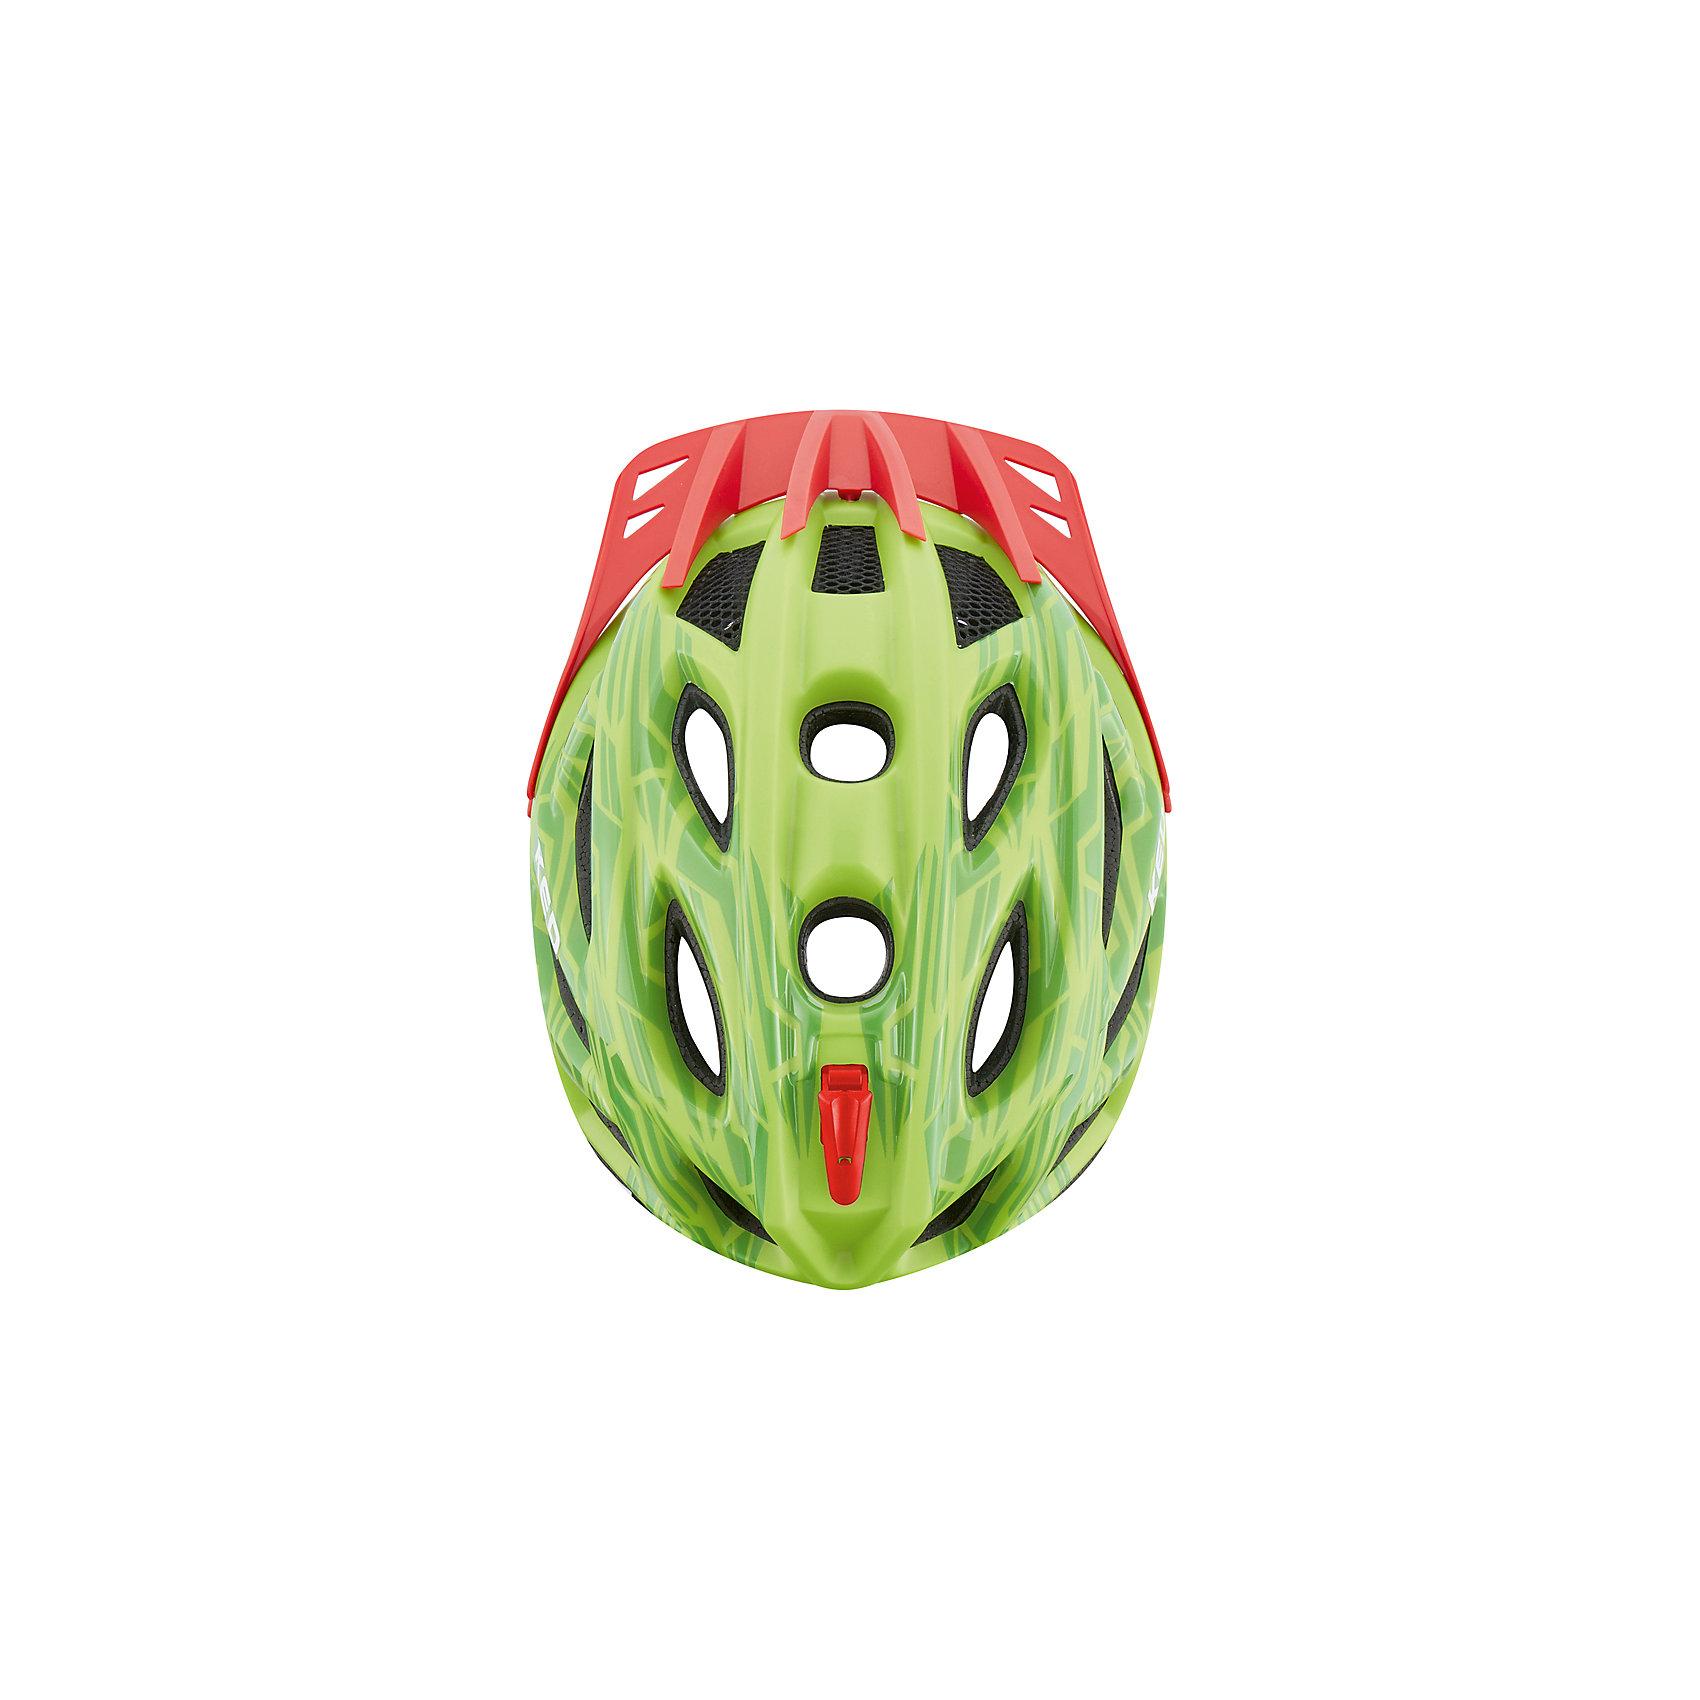 Radsport Neu KED Helmsysteme Fahrradhelm Pylos Helme grün rot matt Gloss 6048275